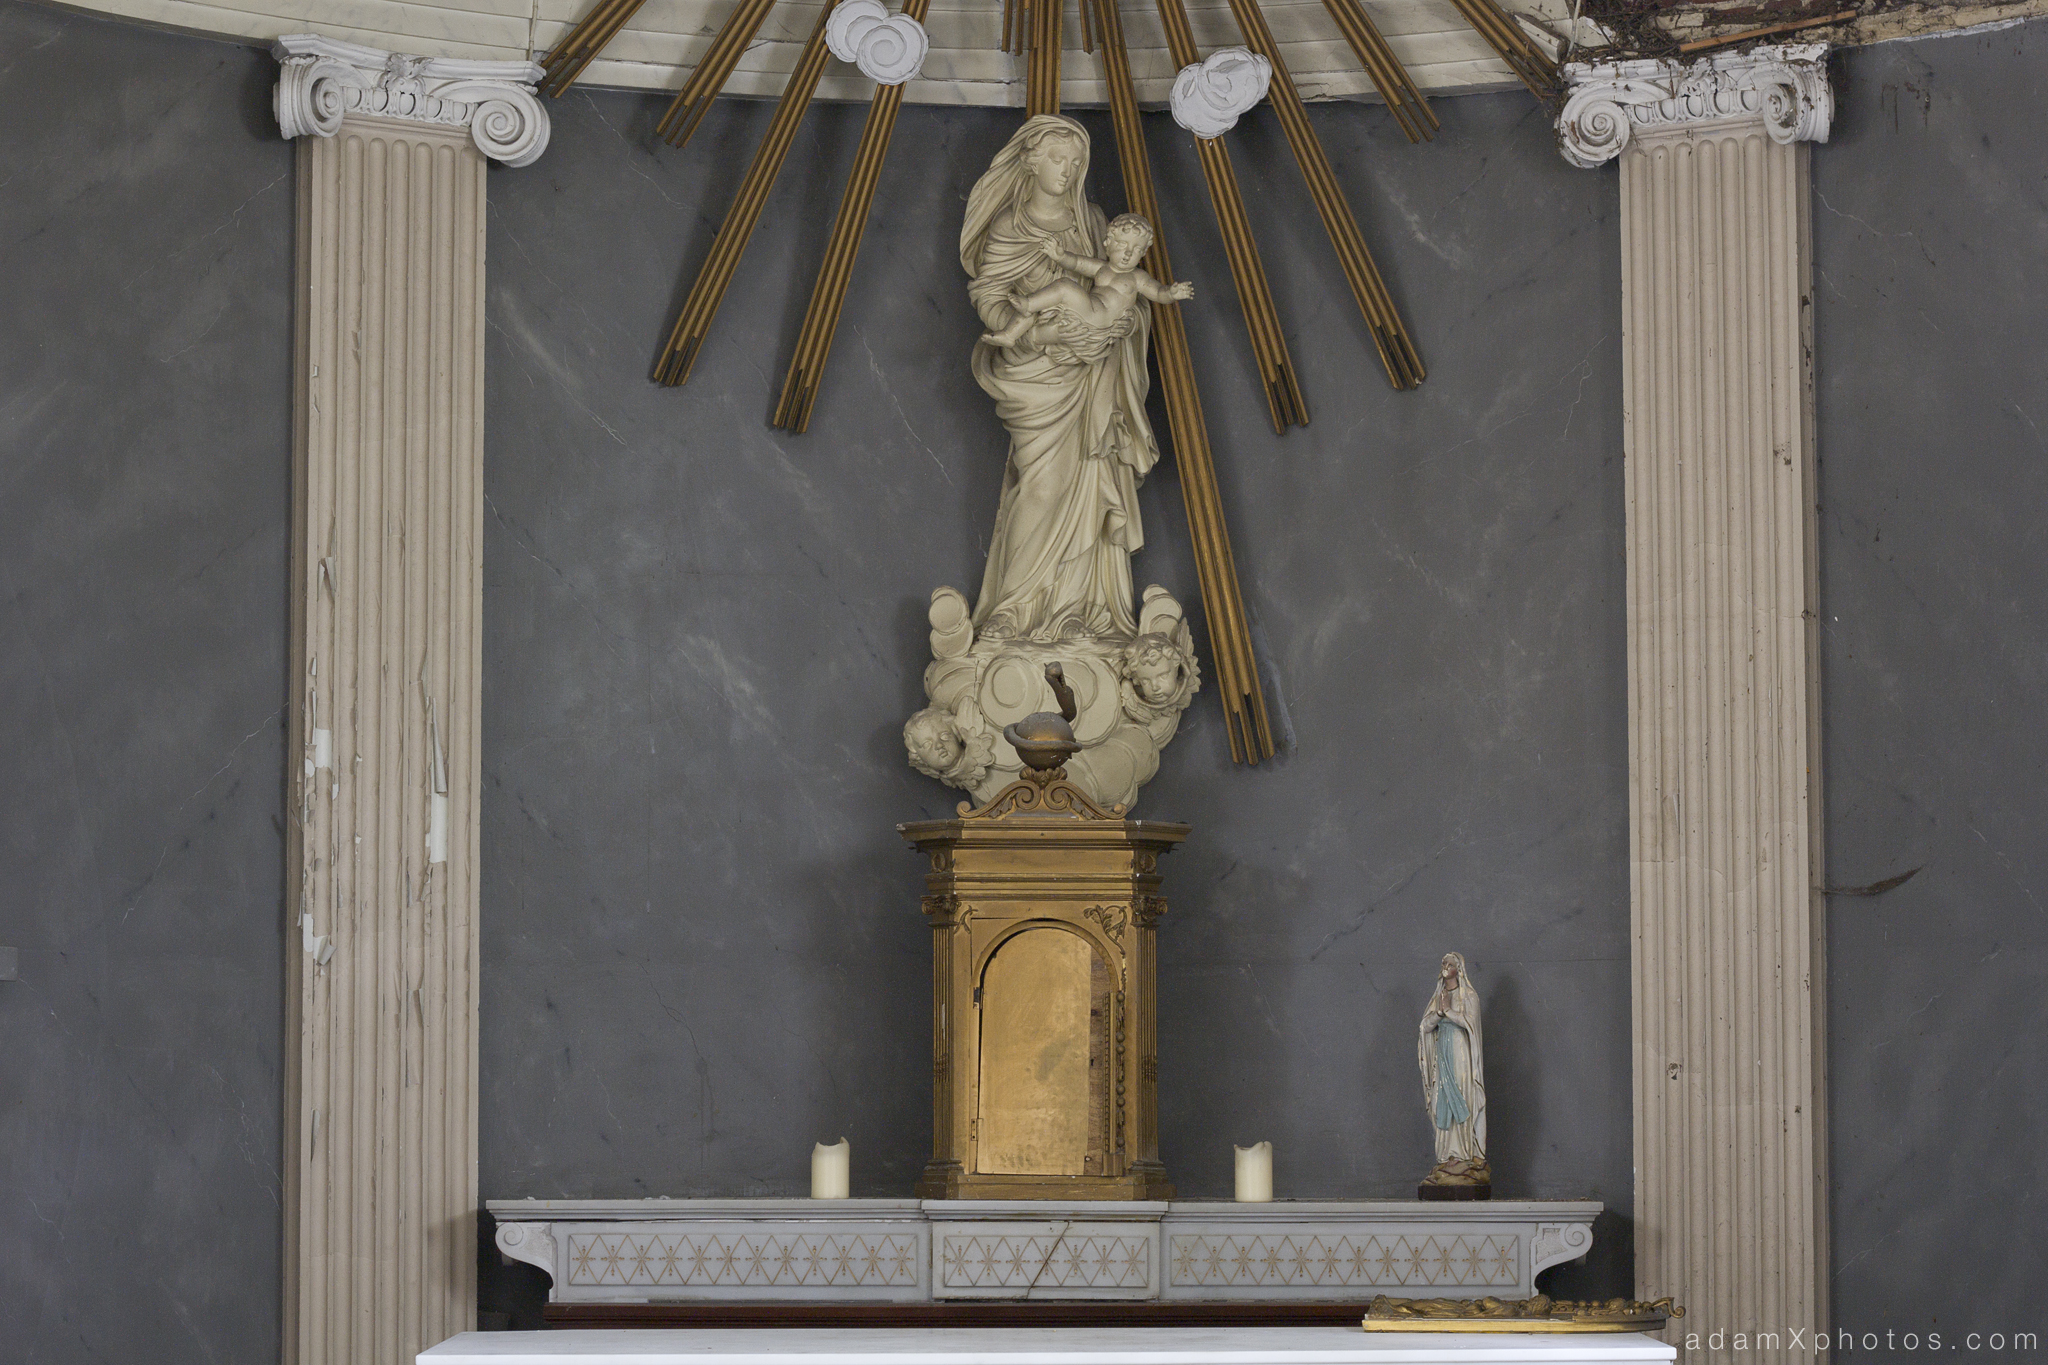 Adam X Chateau de la Chapelle urbex urban exploration belgium abandoned statue chapel